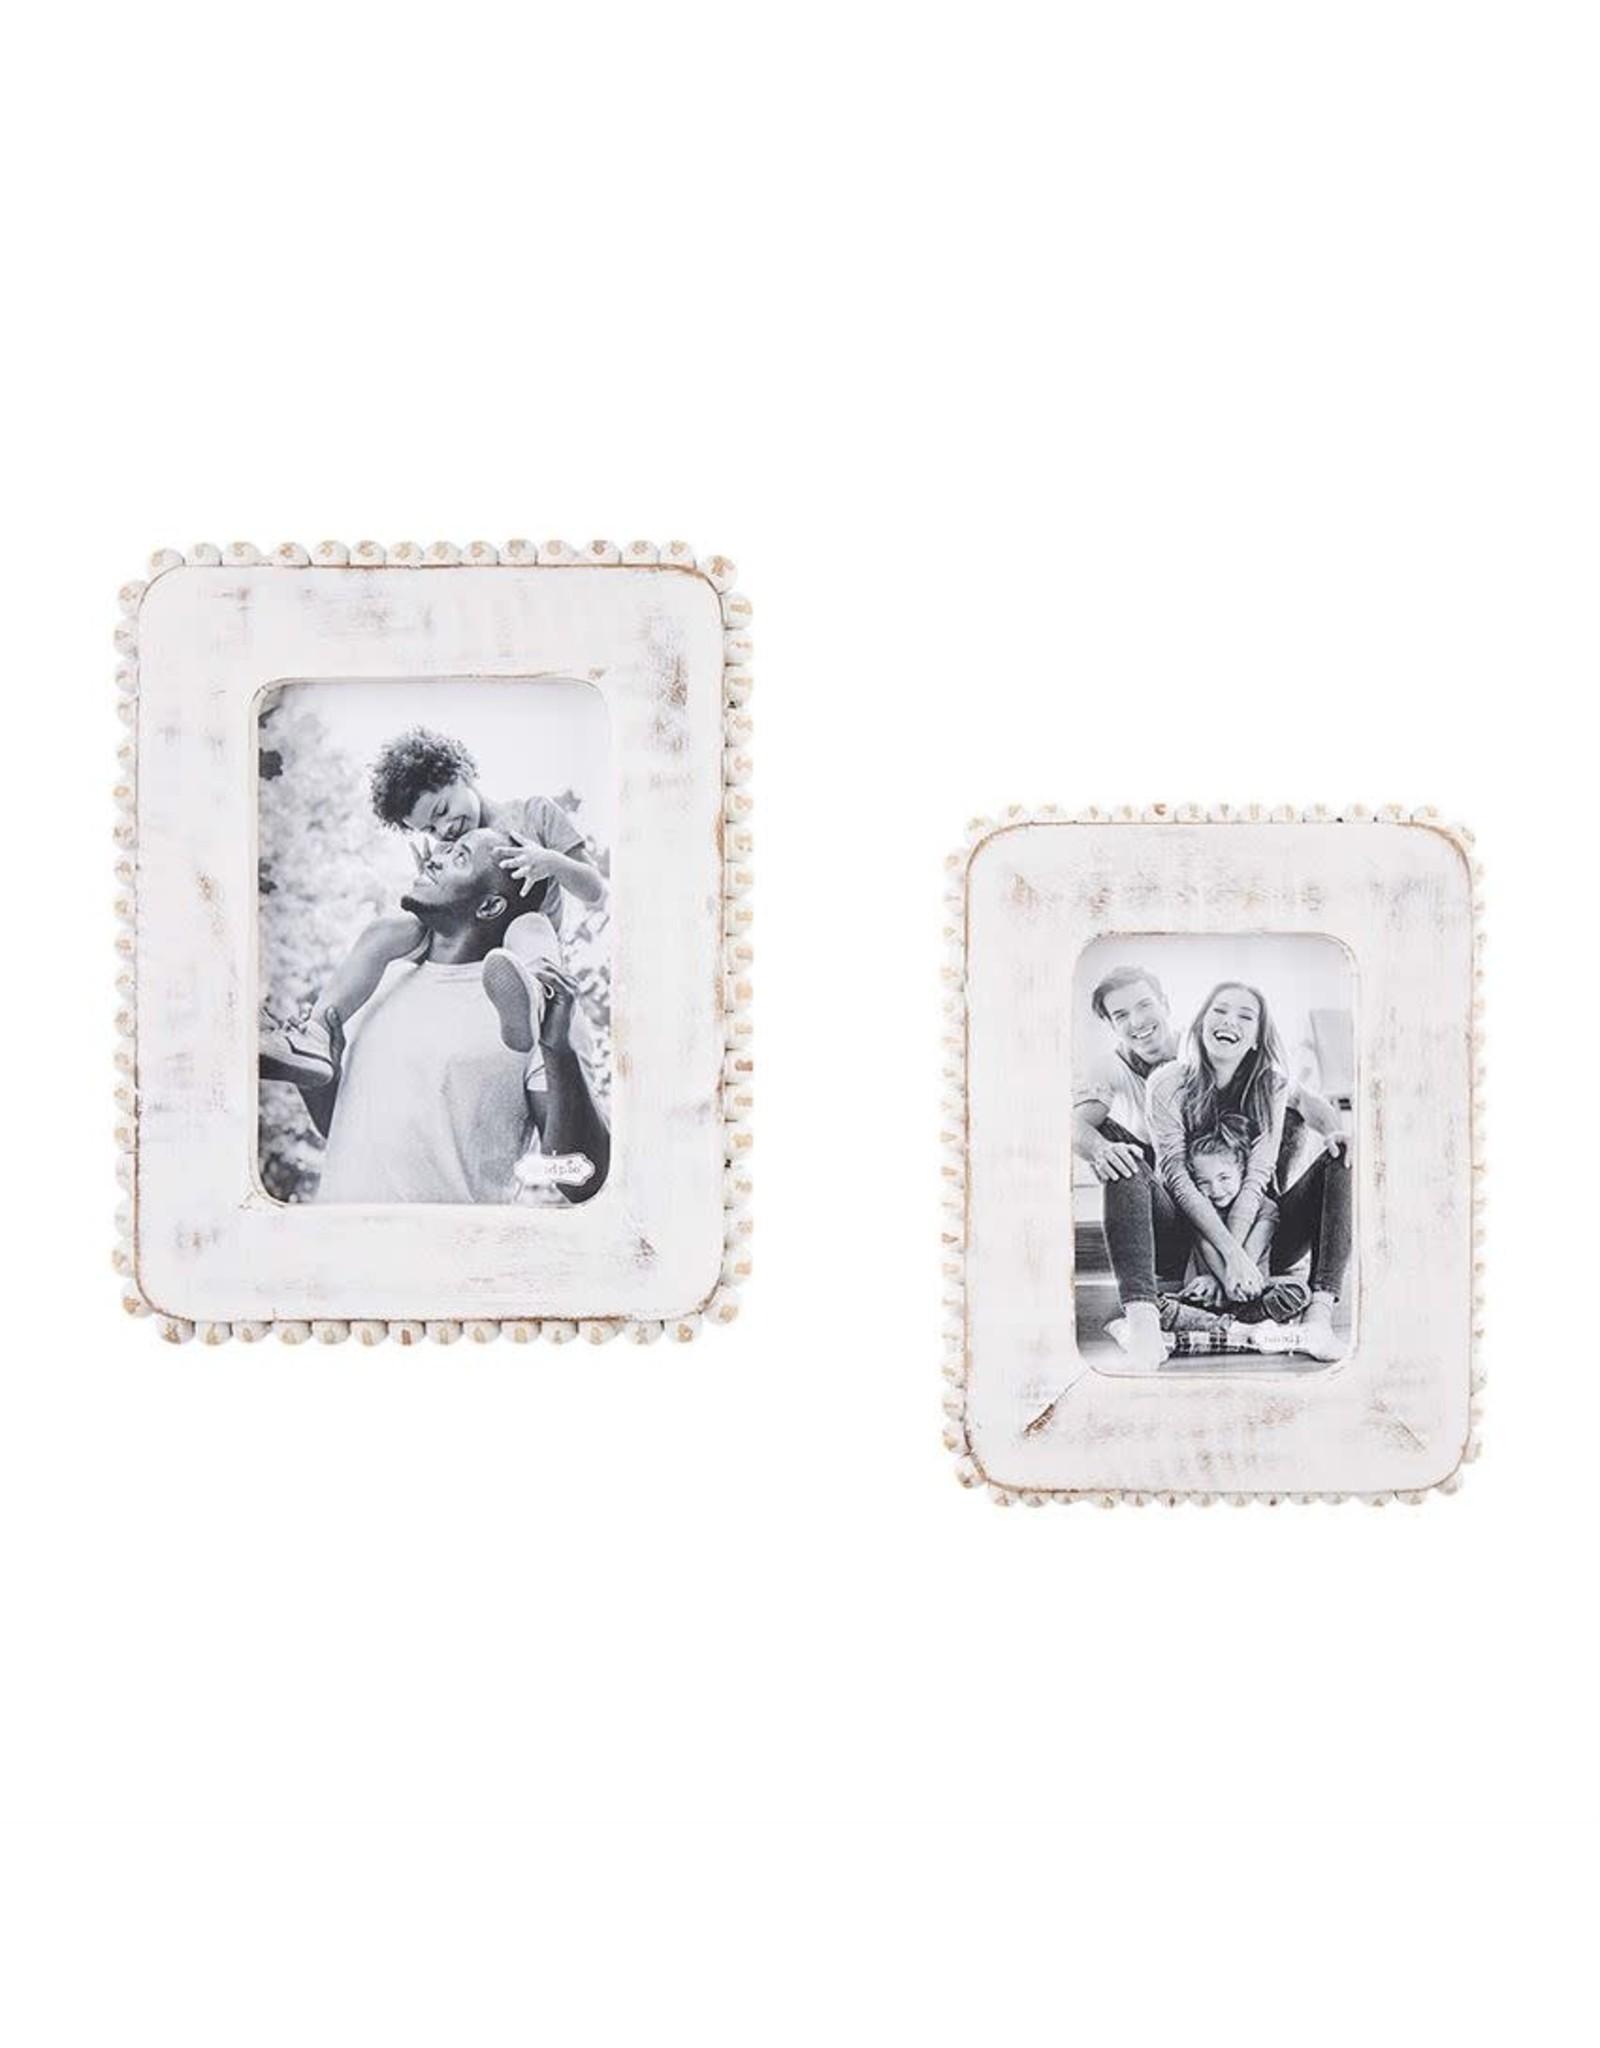 Mudpie White Beaded Wood Frame - 5x7